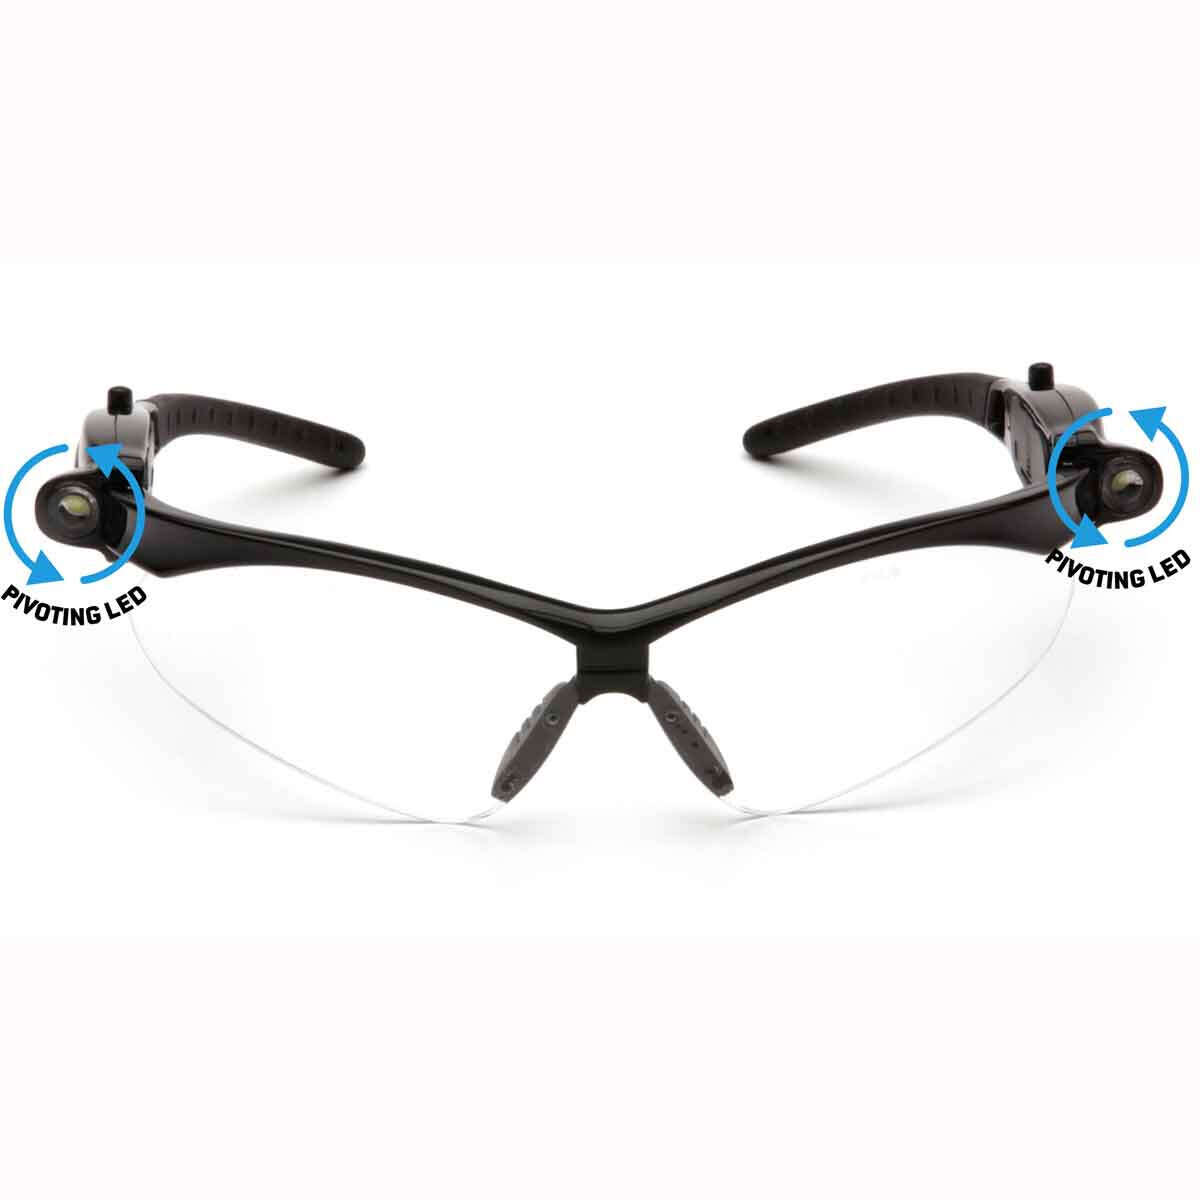 SB6310STPLED Pyramex PMXTREME LED Safety Glasses